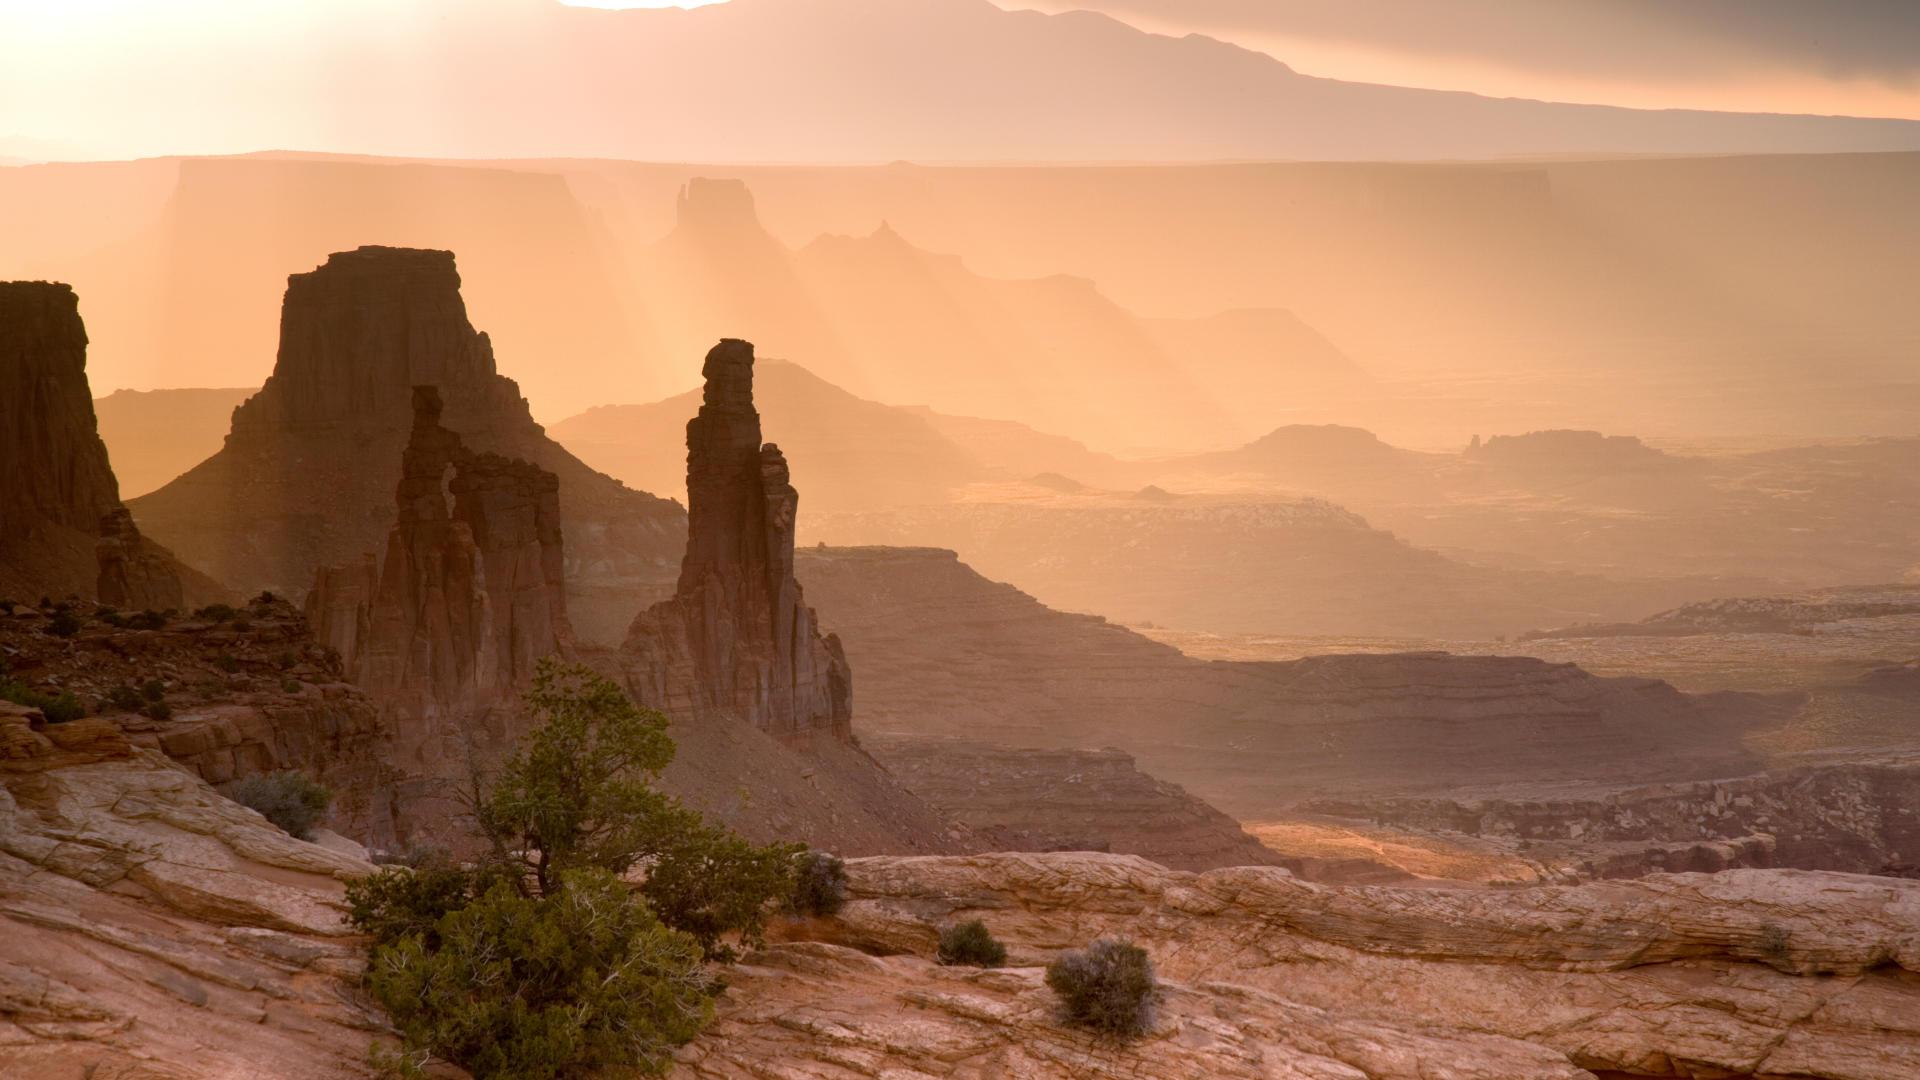 Pubg Wallpaper Hd Desktop Background Images Picture Pics: Canyonlands Wallpaper